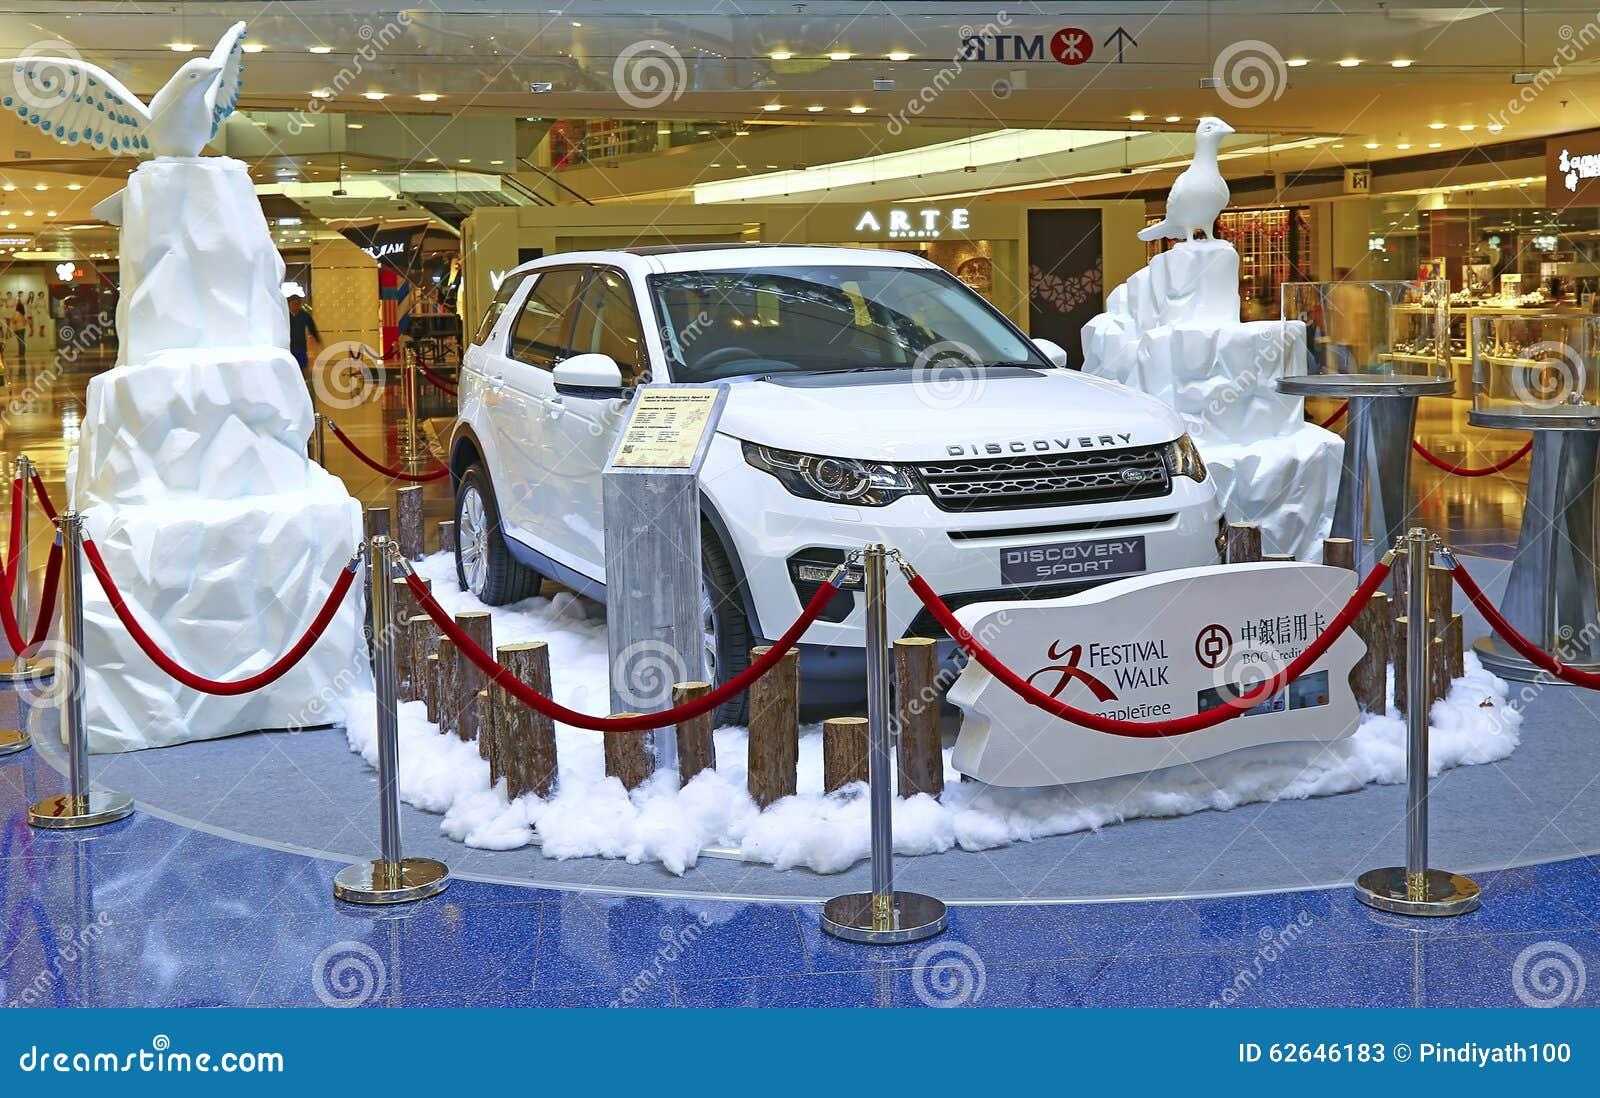 Jaguar Land Rover: Brexit threatens plan to spend $100 billion in UK